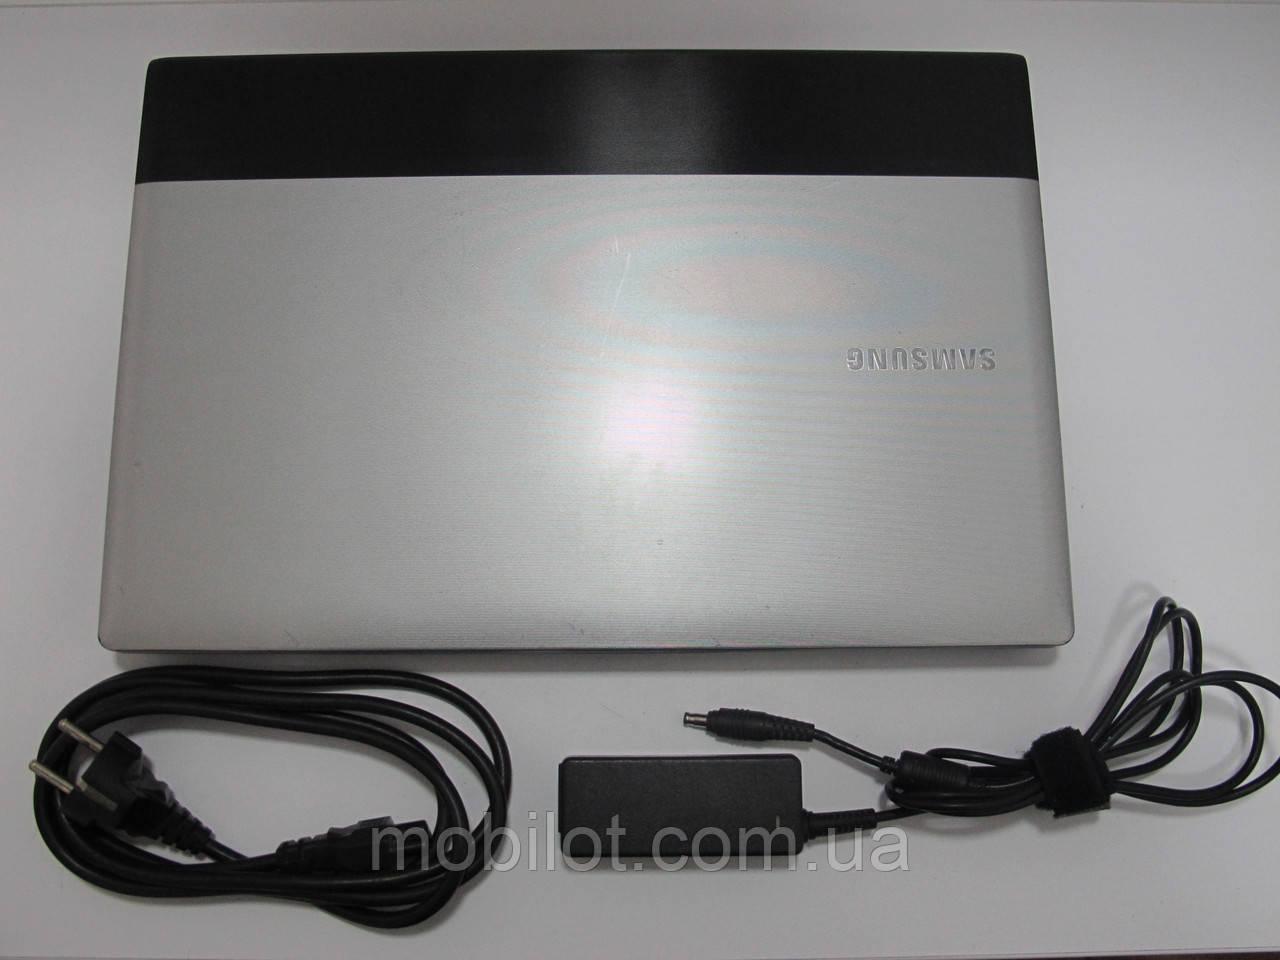 Ноутбук Samsung RV509 (NR-5073)